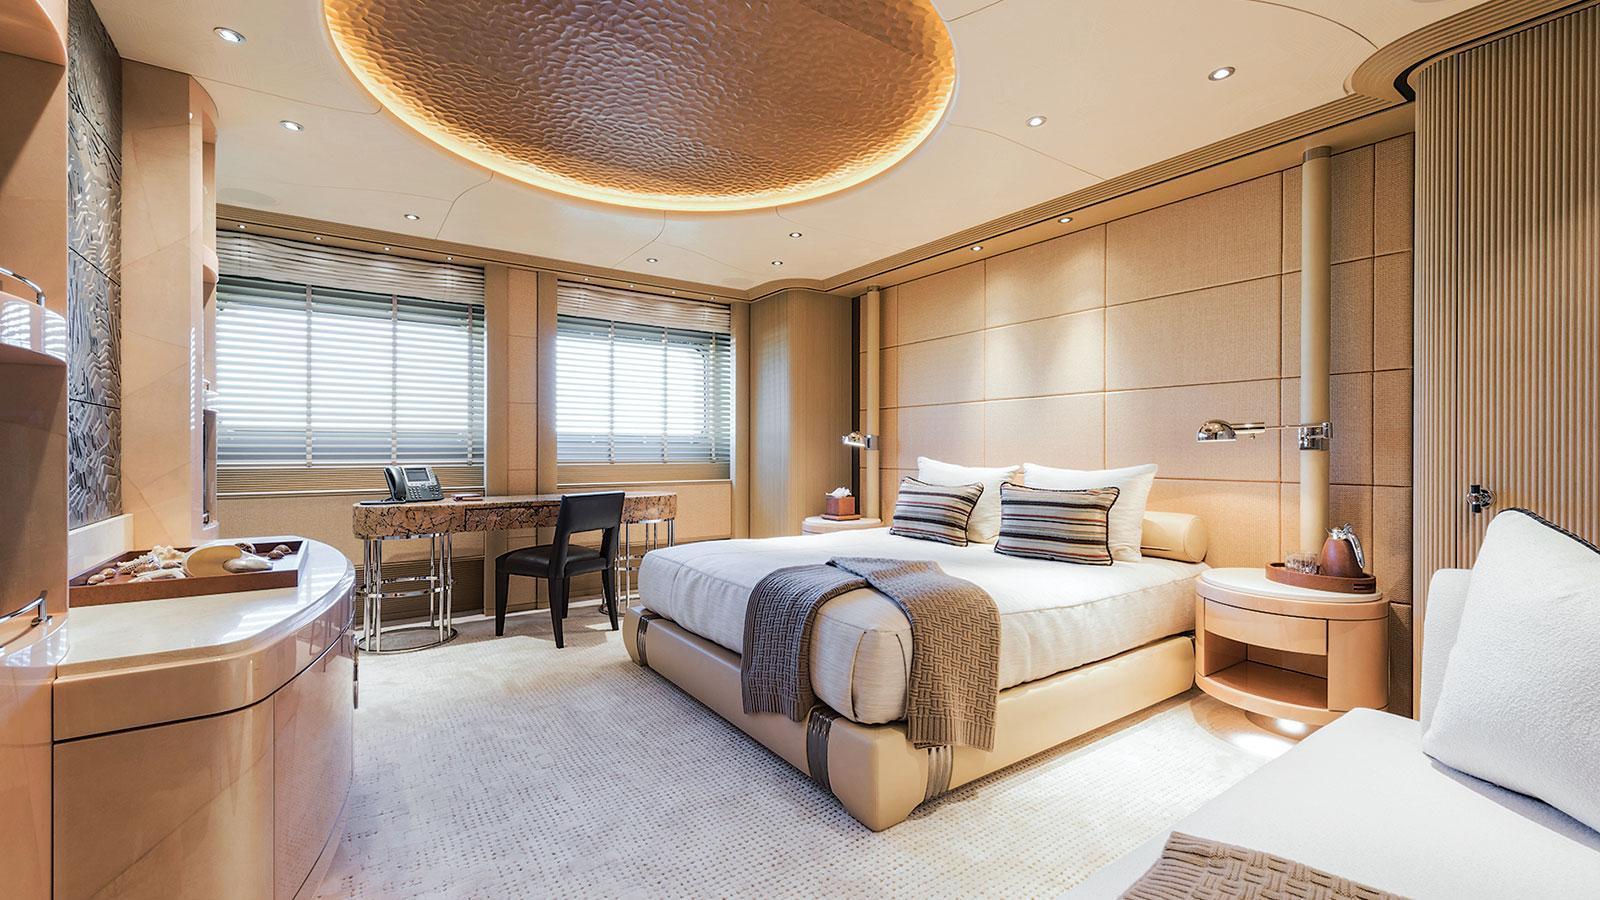 romea-motor-yacht-abeking-rasmussen-2015-82m-stateroom